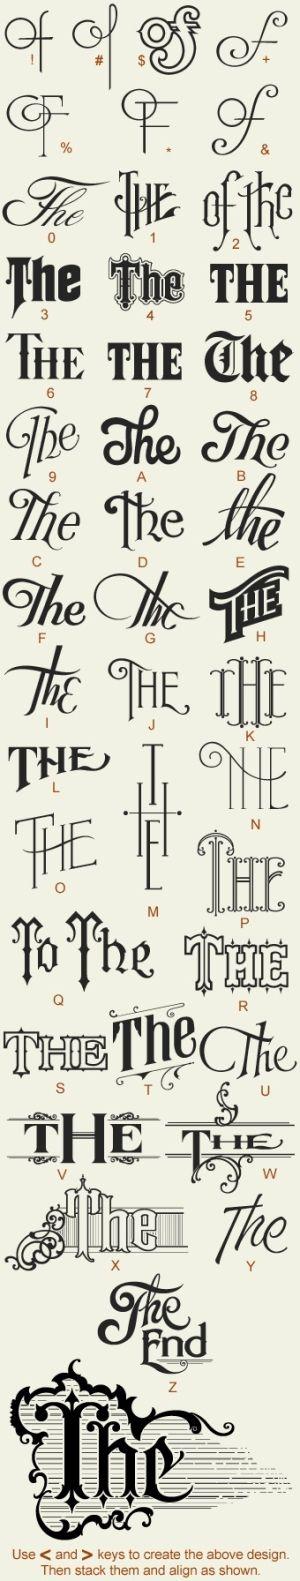 lovely lettering by ethel